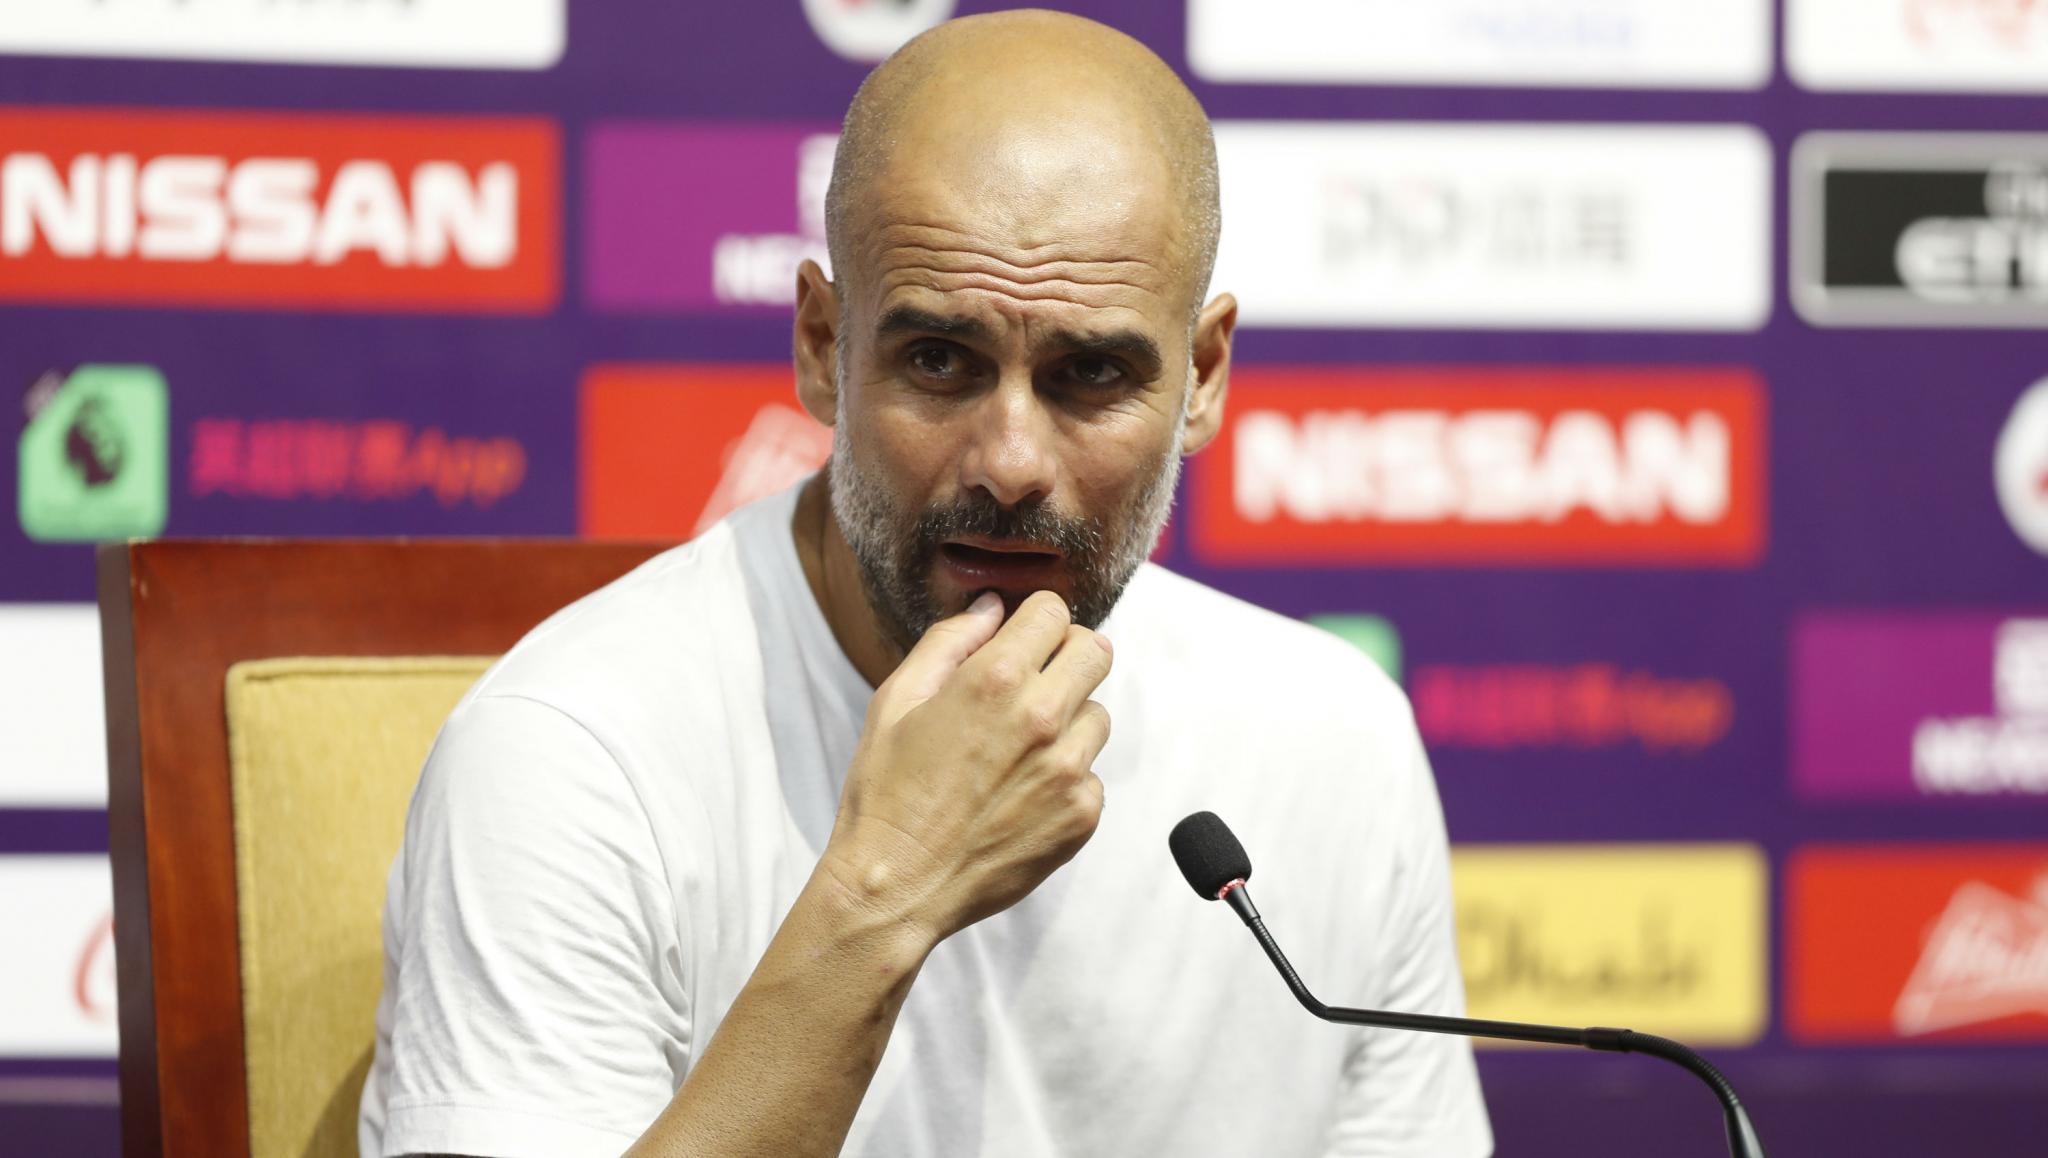 Liverpool vs Manchester City, Premier League 2019: Pep Guardiola Fearless Despite Man City's Poor Anfield Record